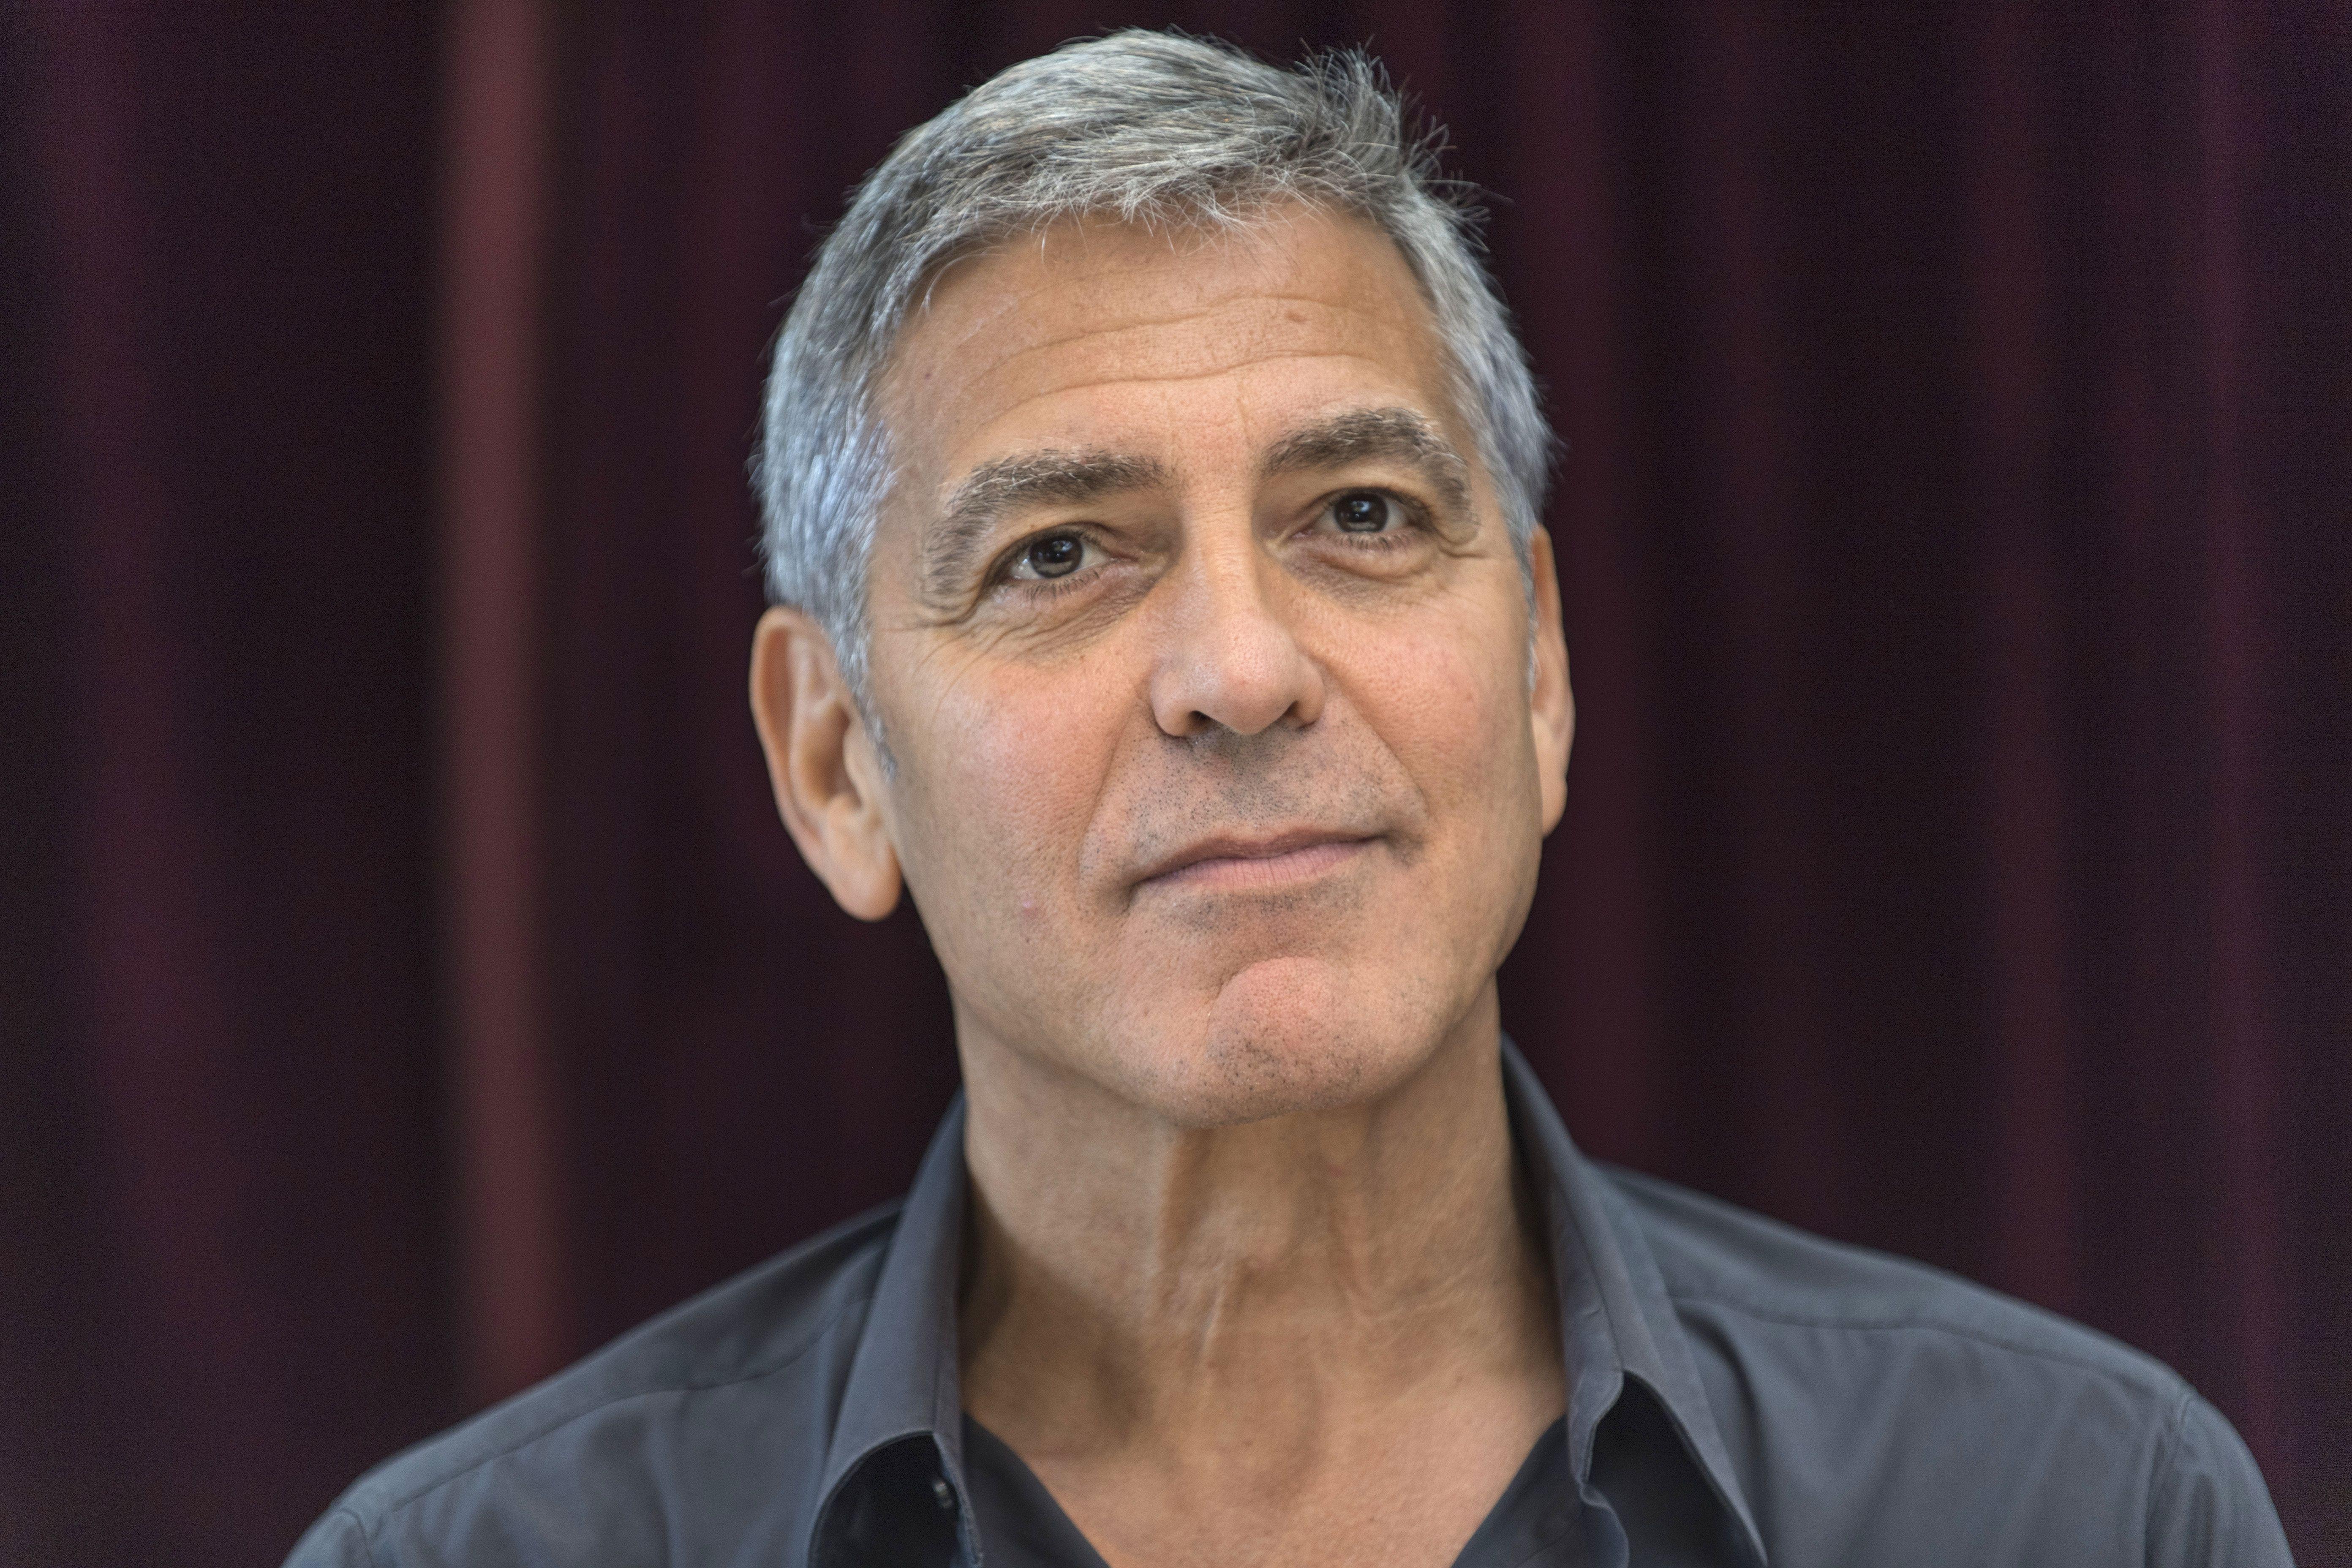 Джордж Клуни ответил на речь Тома Круза о Covid-19: « Он не слишком остро отреагировал »